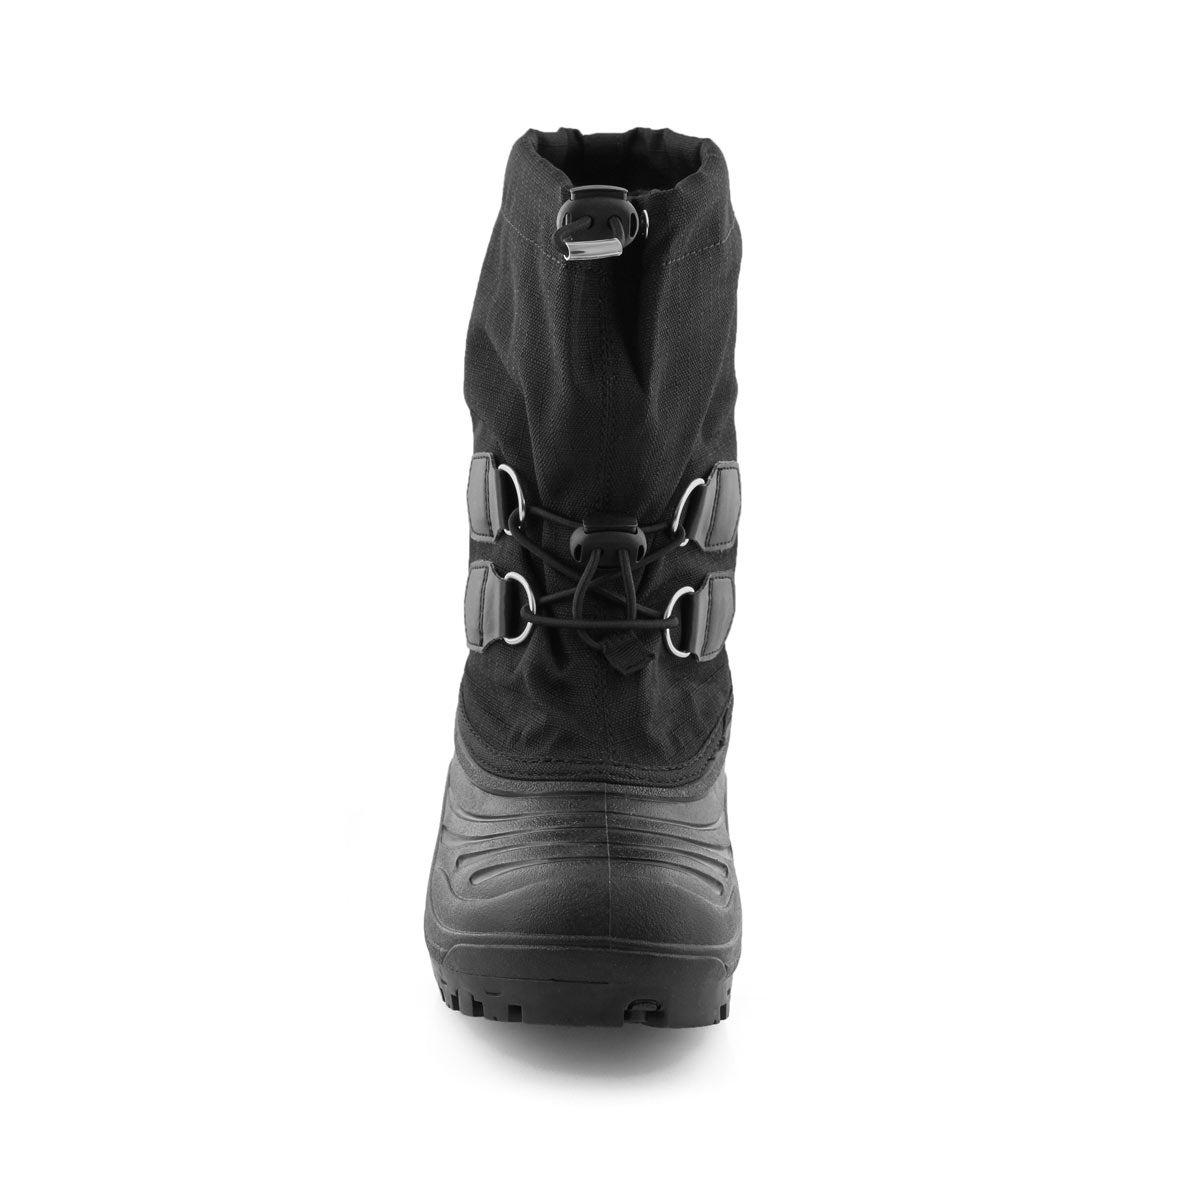 Kids' SUPER TROOPER  black/grey snow boots